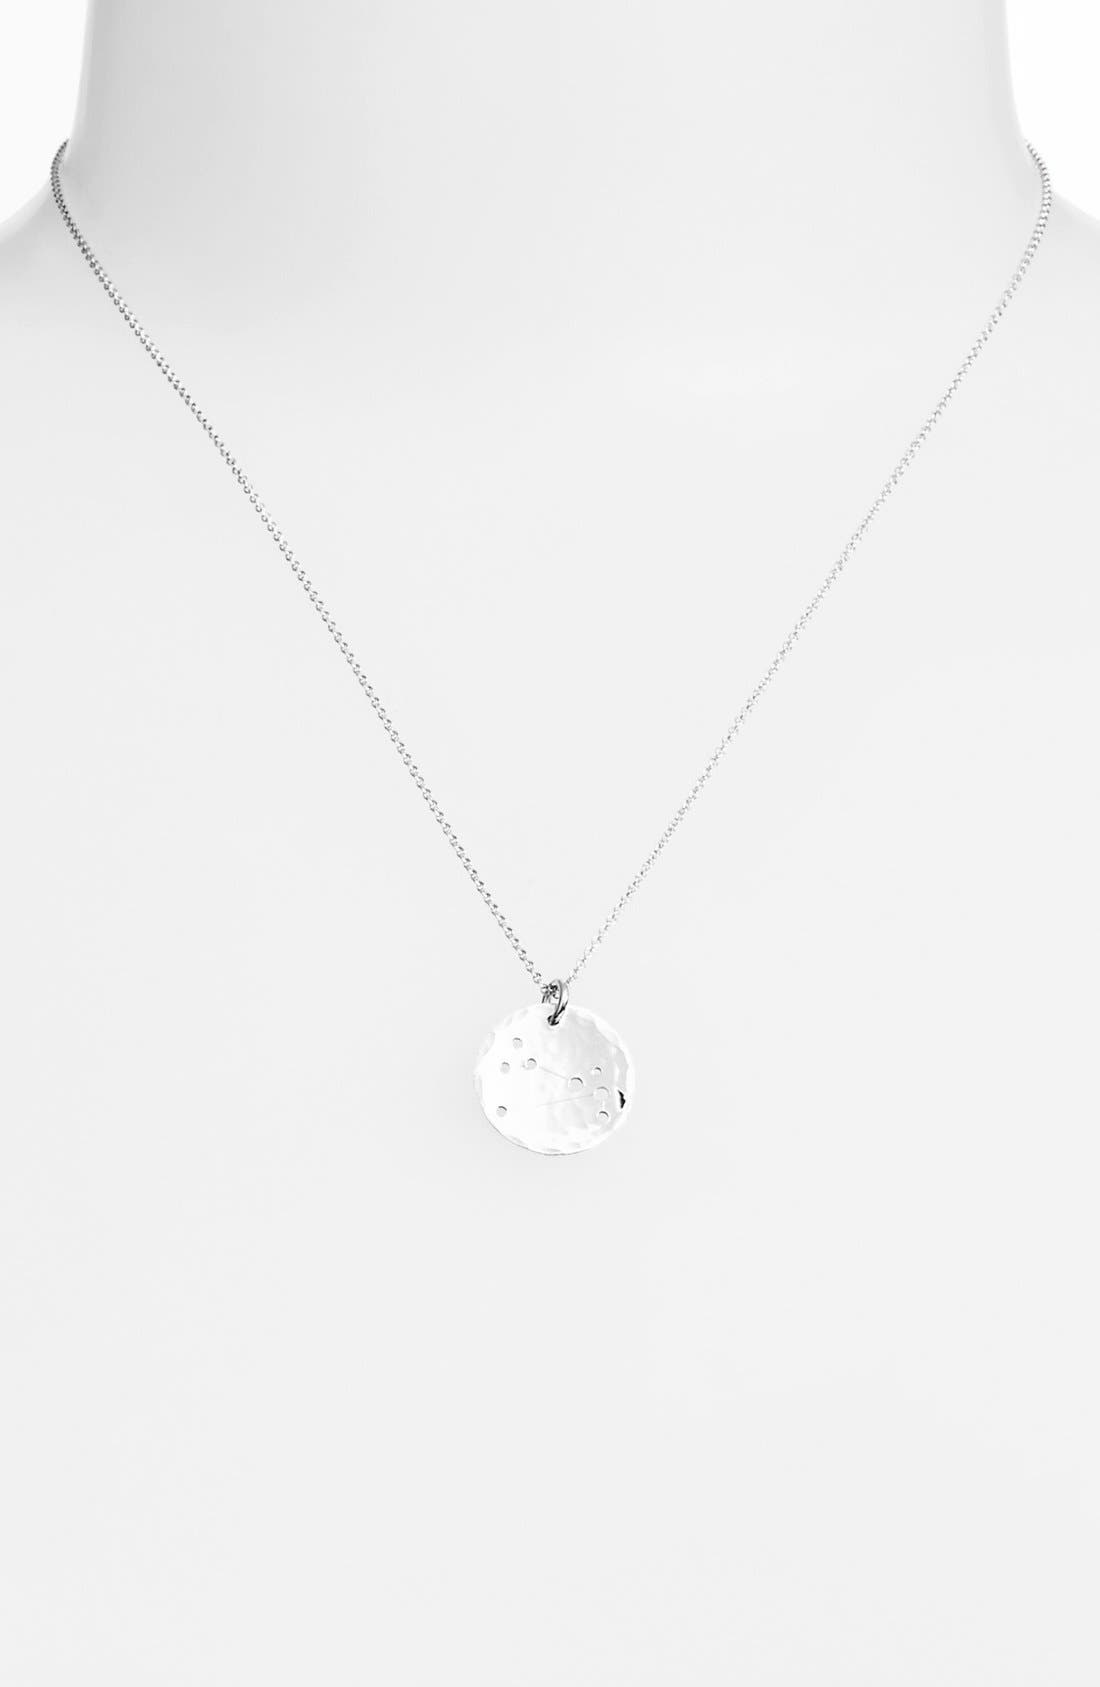 Ija 'Small Zodiac' Sterling Silver Necklace,                         Main,                         color,